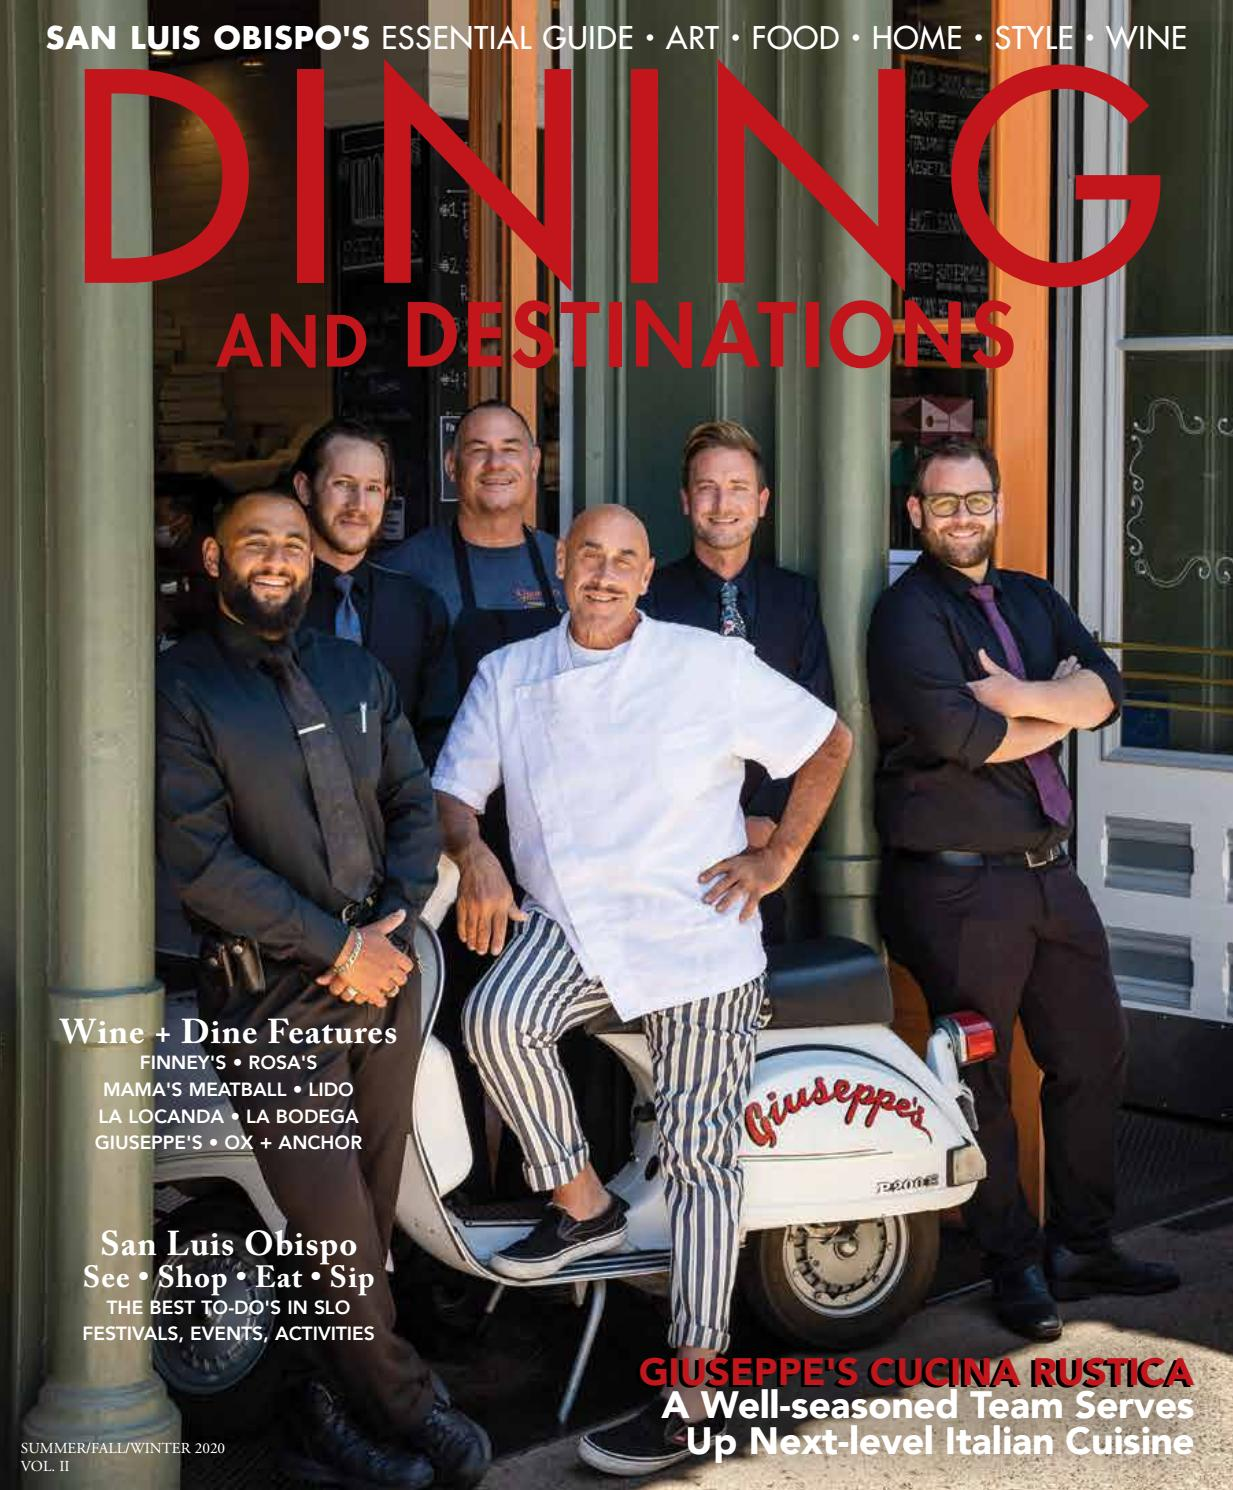 san luis obispo dining and destinations